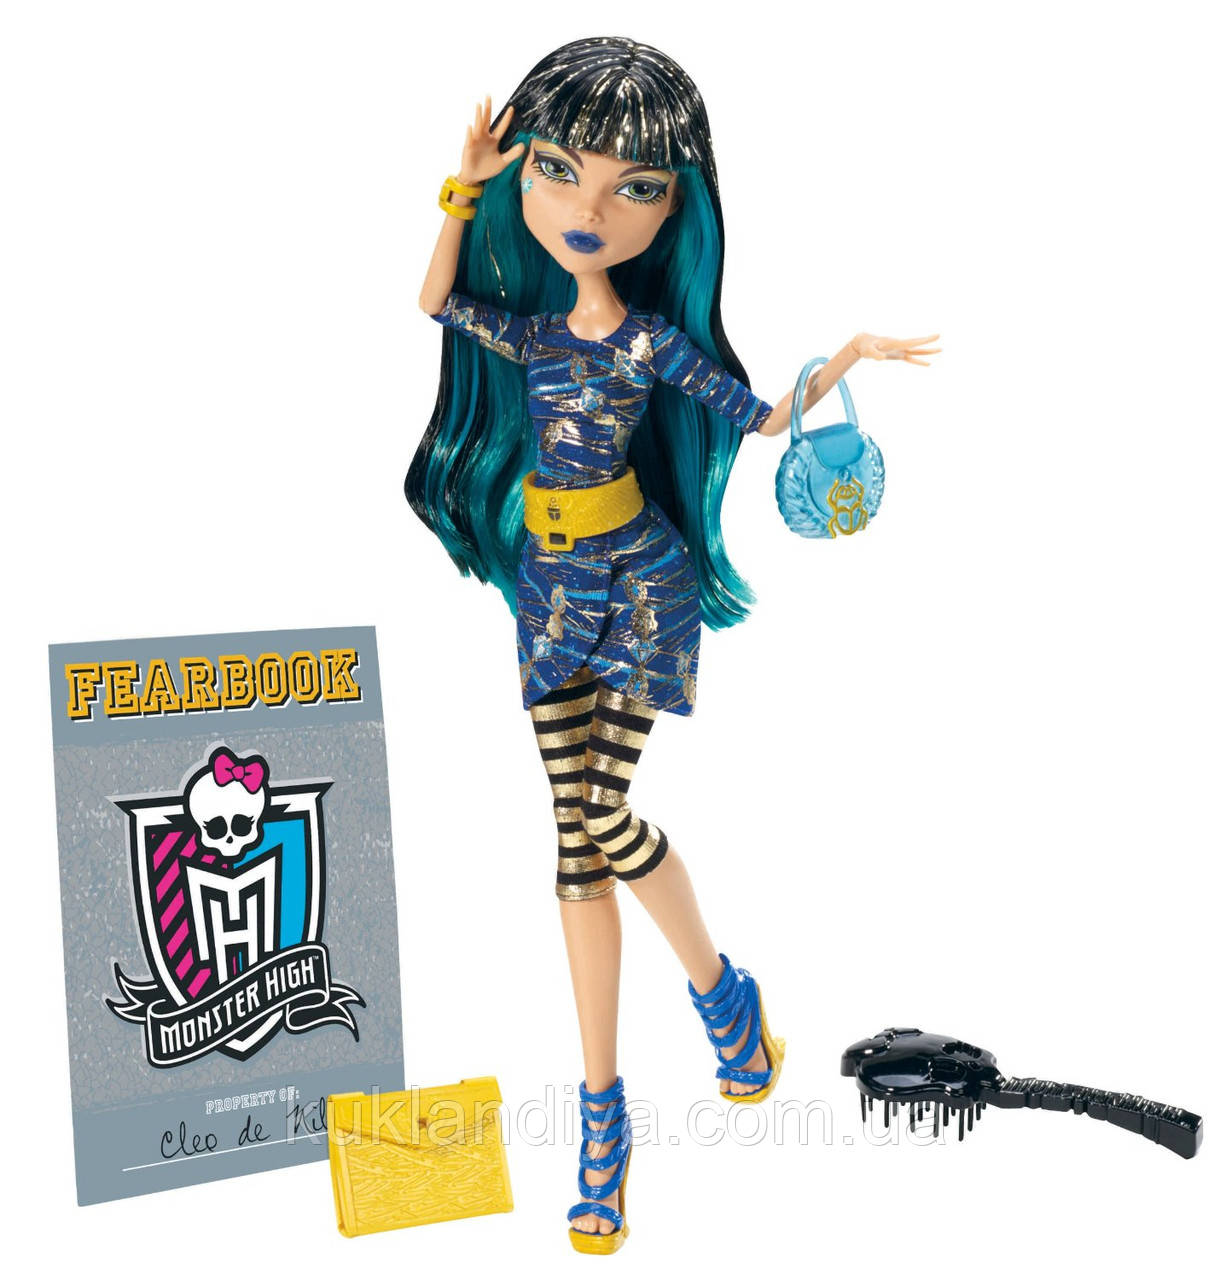 Кукла Monster High Клео де Нил День фото - Picture Day